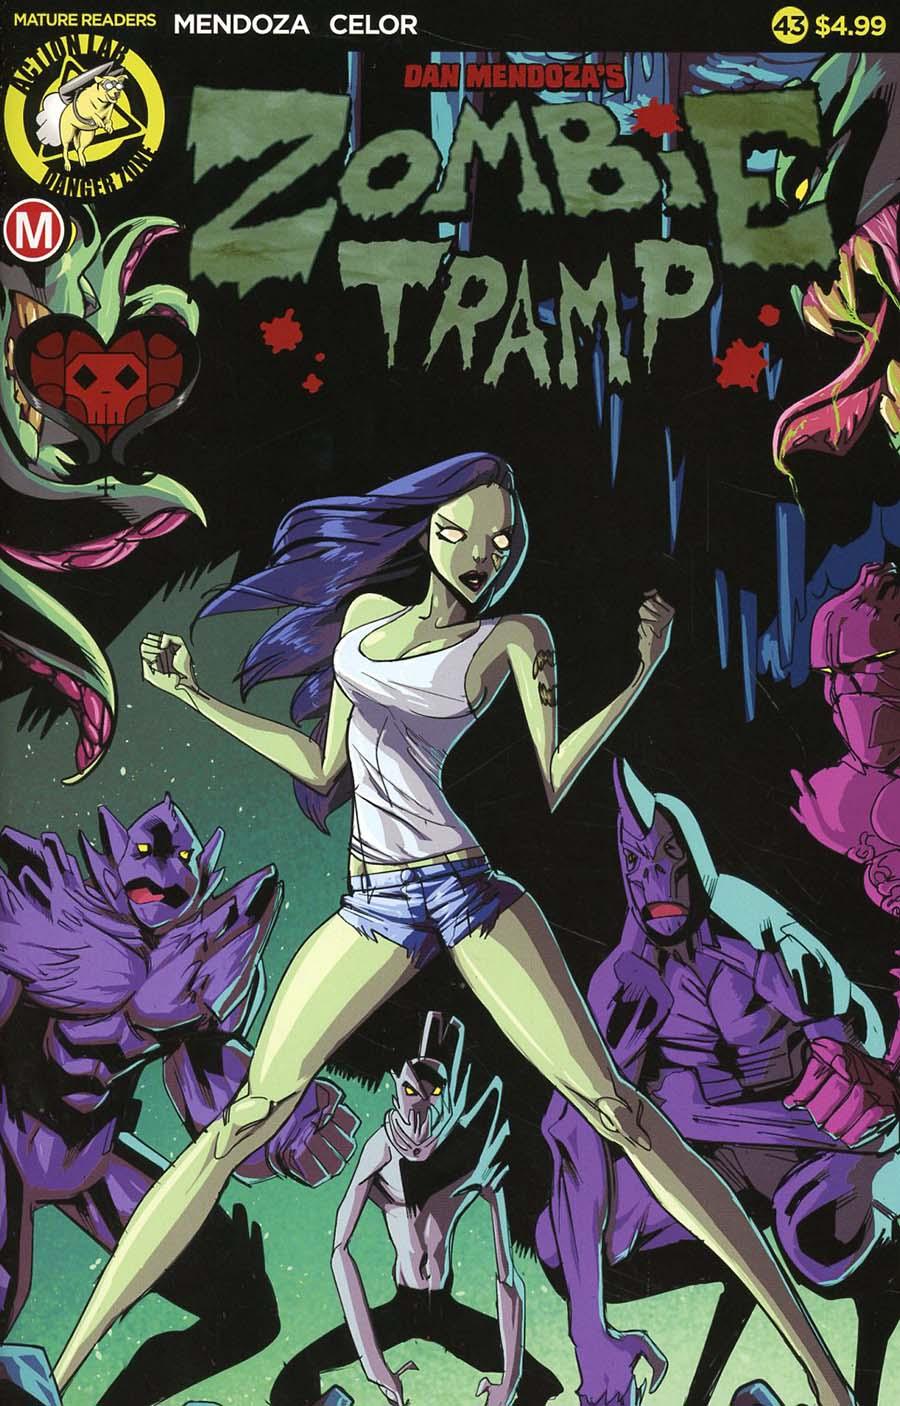 Zombie Tramp Vol 2 #43 Cover A Regular Celor Cover